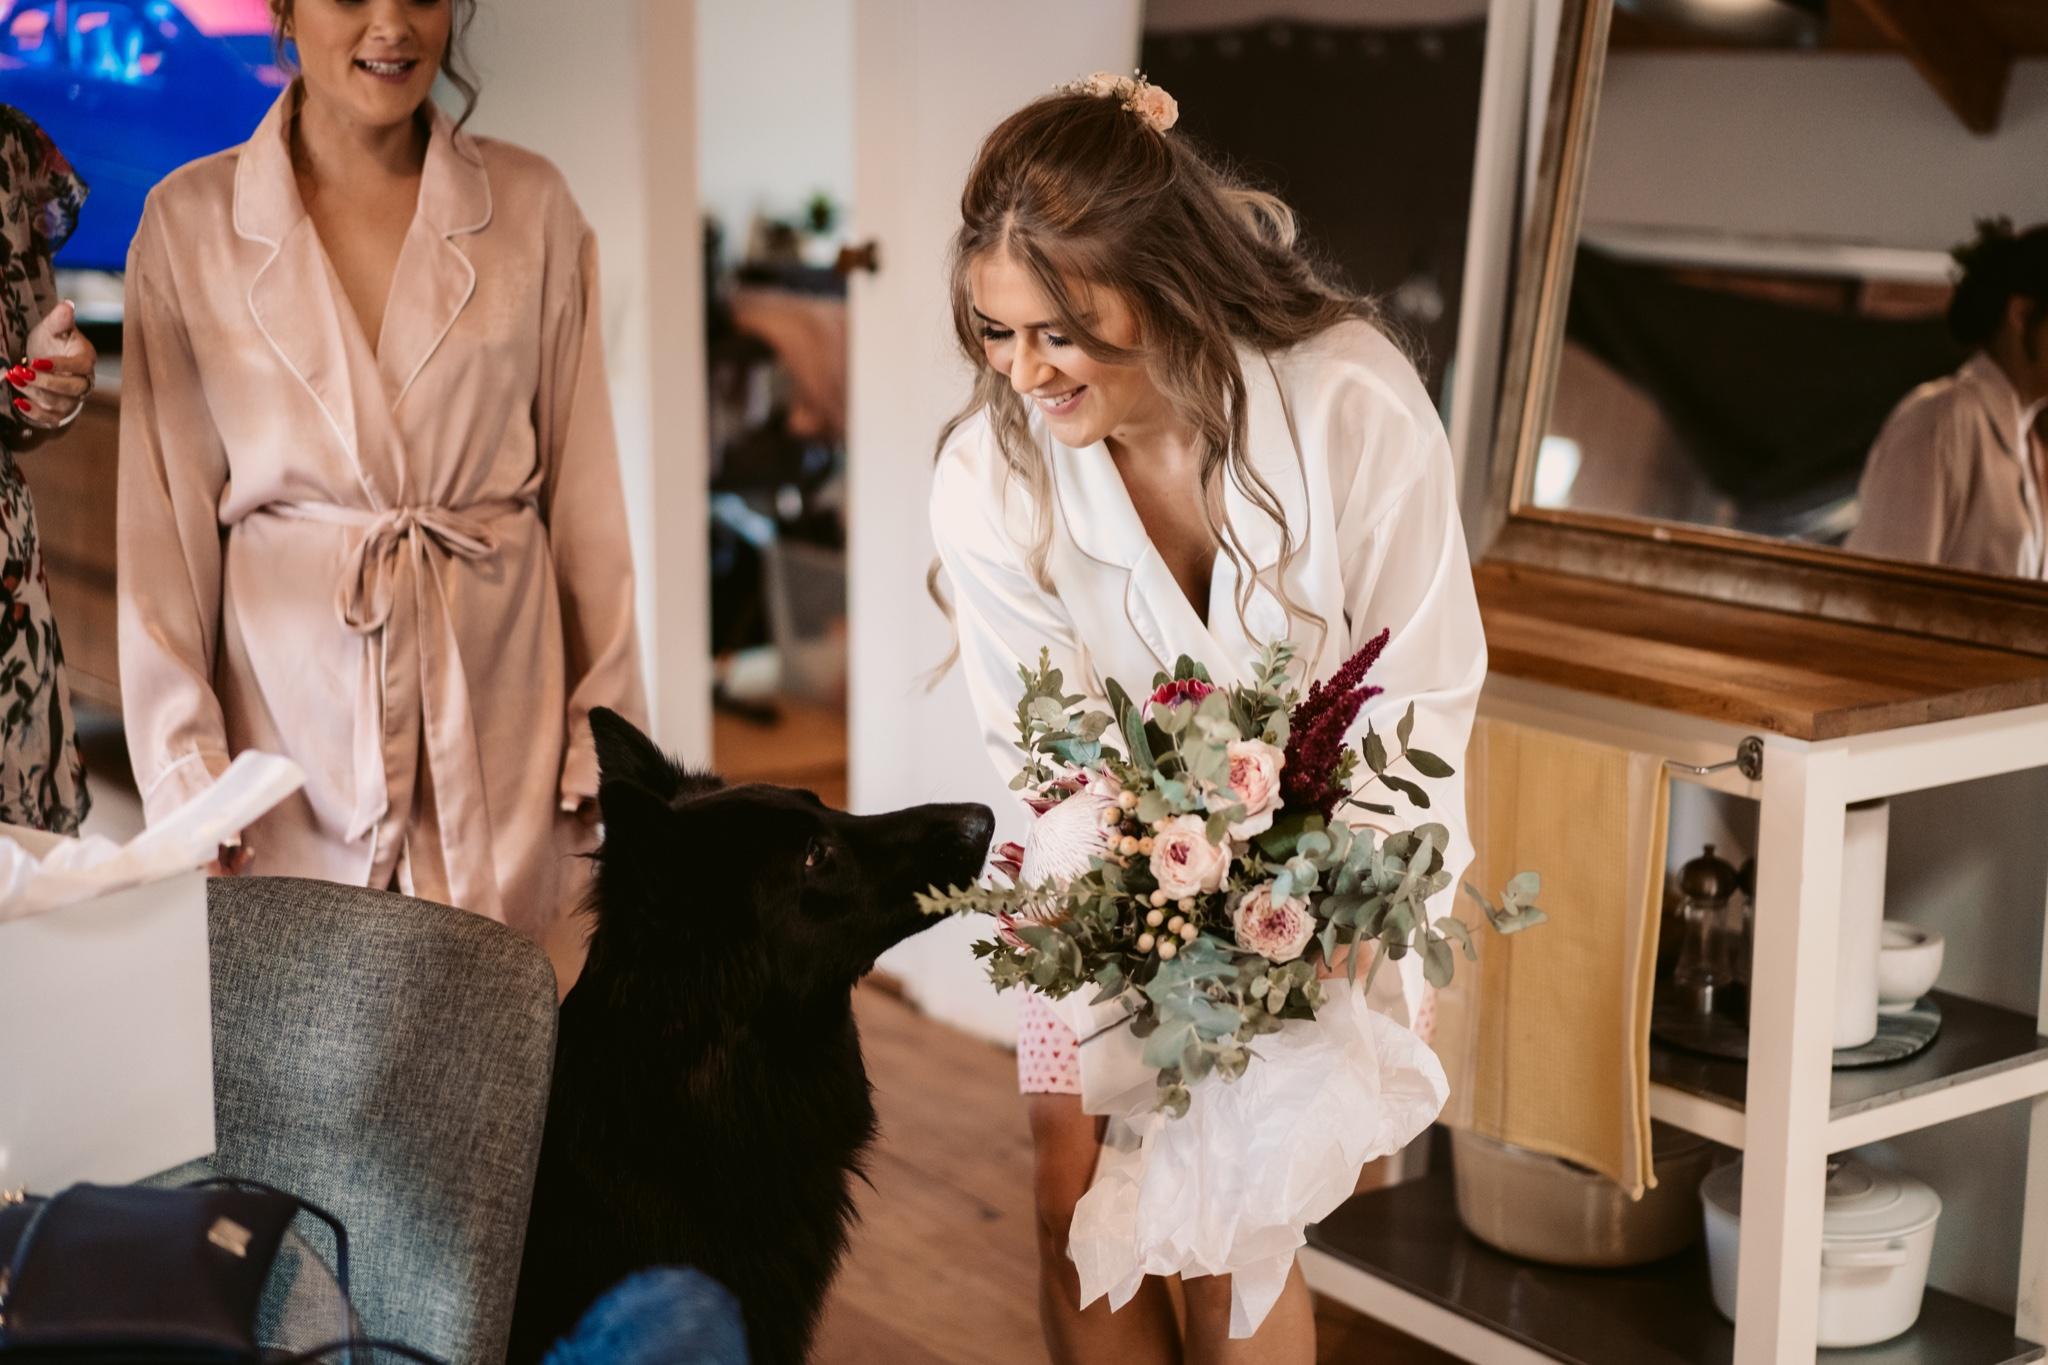 Mornington Peninsula Wedding Photography14.jpg